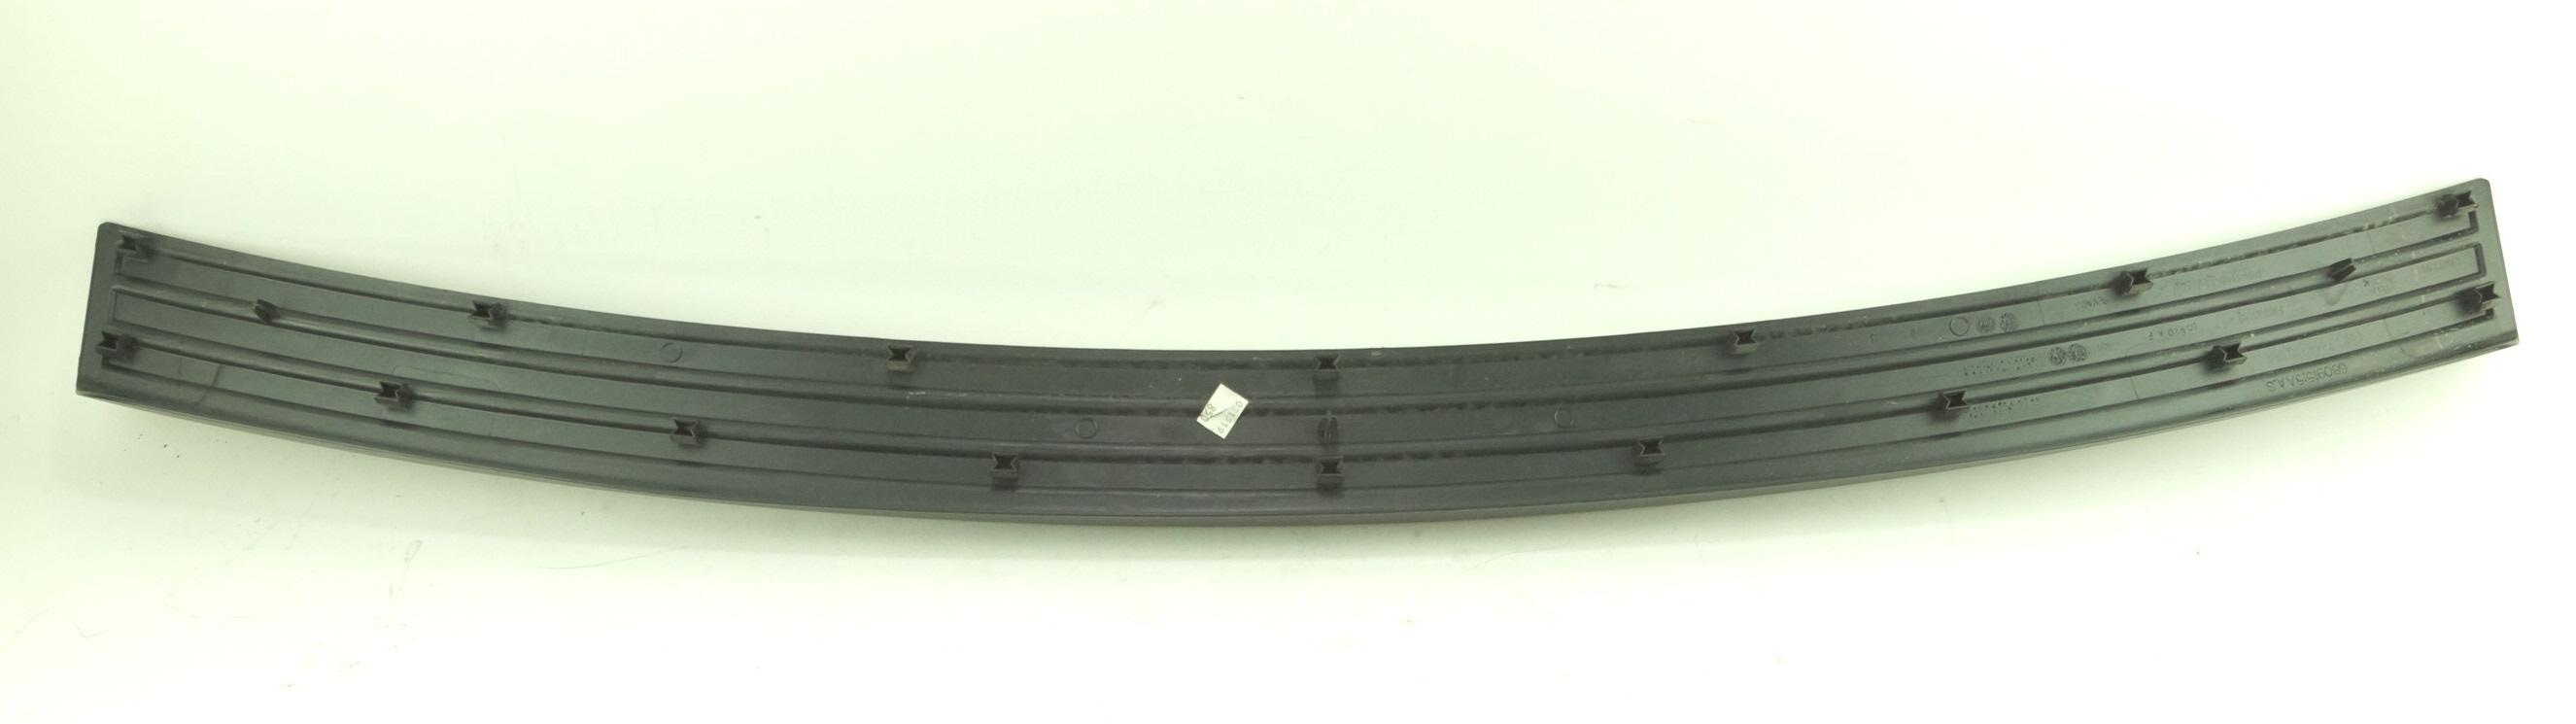 New OEM 68091515-AA Genuine Mopar Rear Fascia Bumper Step Pad Fast Free Shipping - image 5